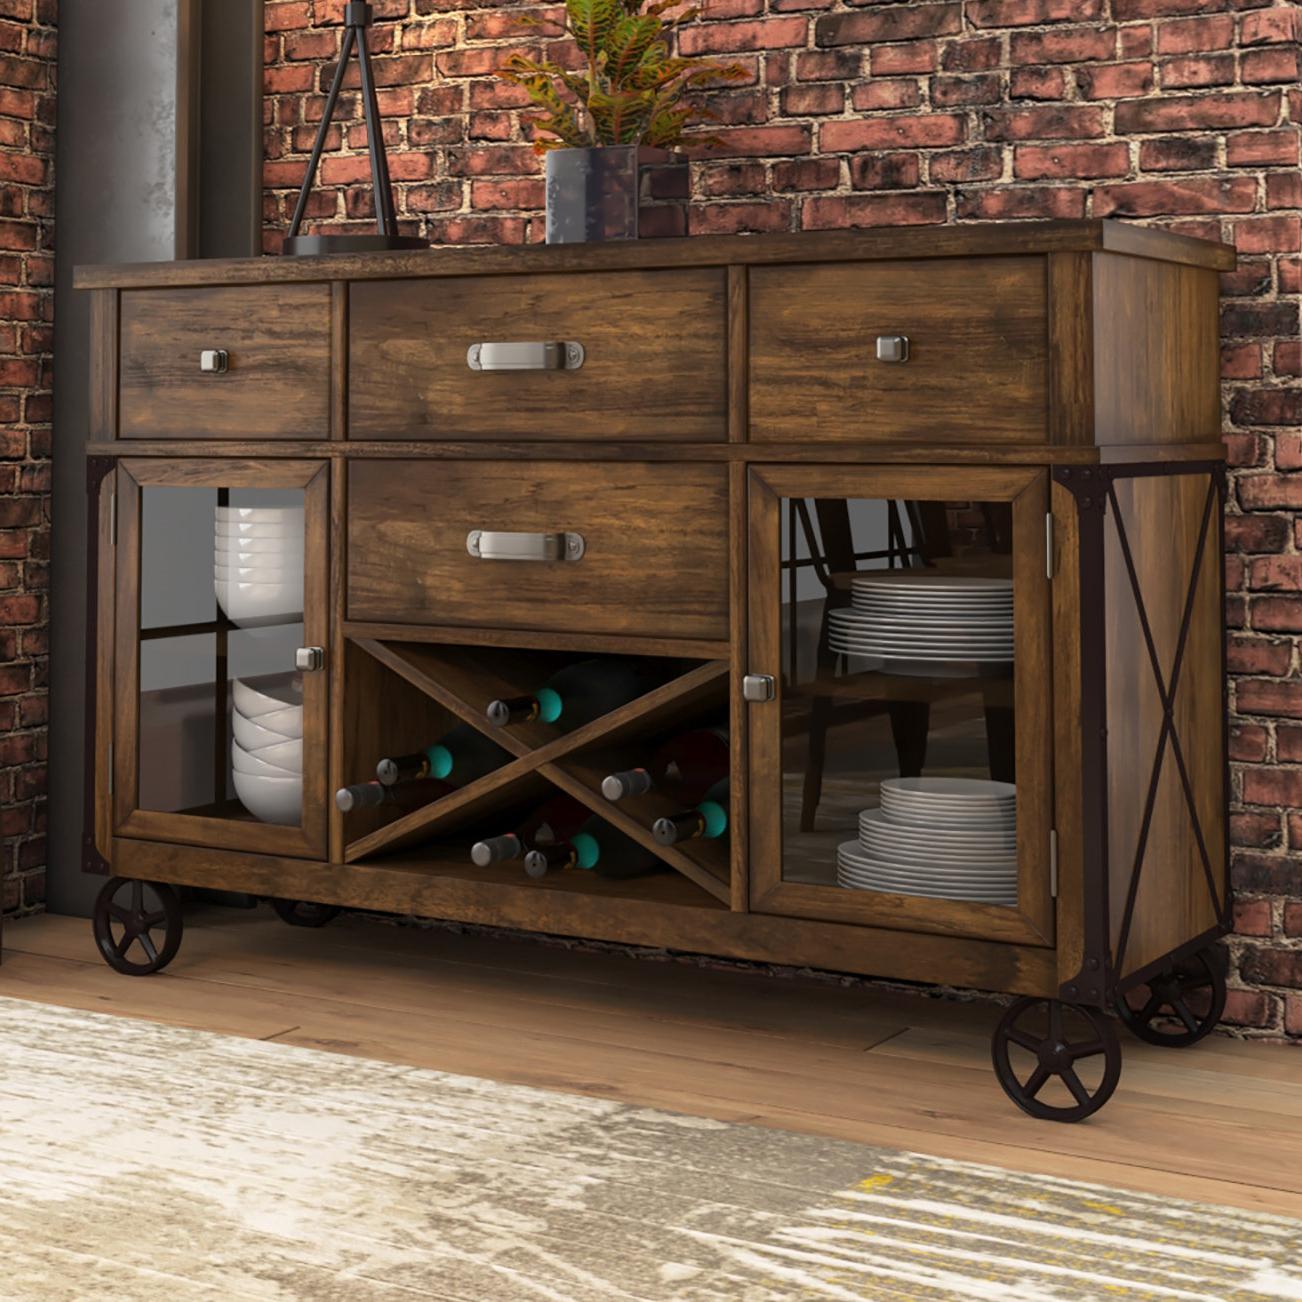 Dark Brown Wood & Medium Brown Wood Sideboards & Buffets You With Regard To Weinberger Sideboards (View 19 of 20)